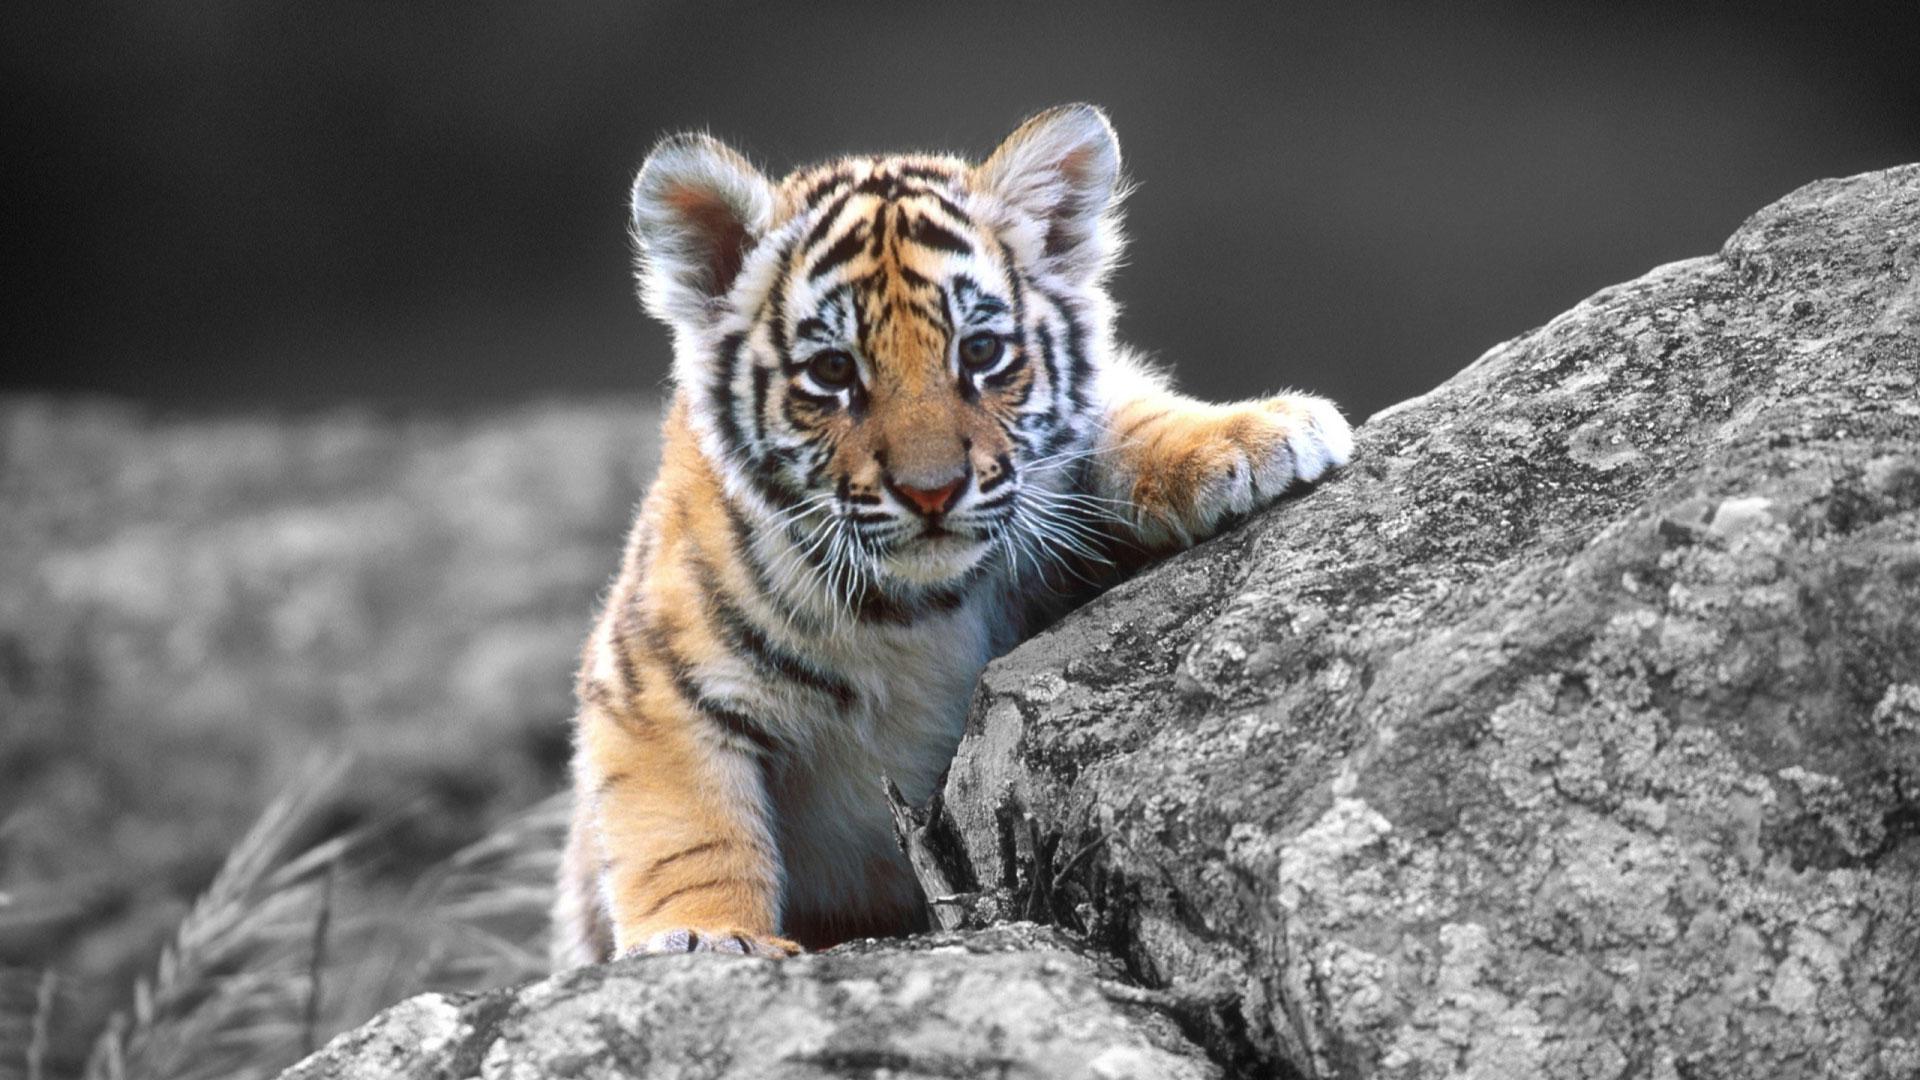 Adorable Tiger Wallpaper